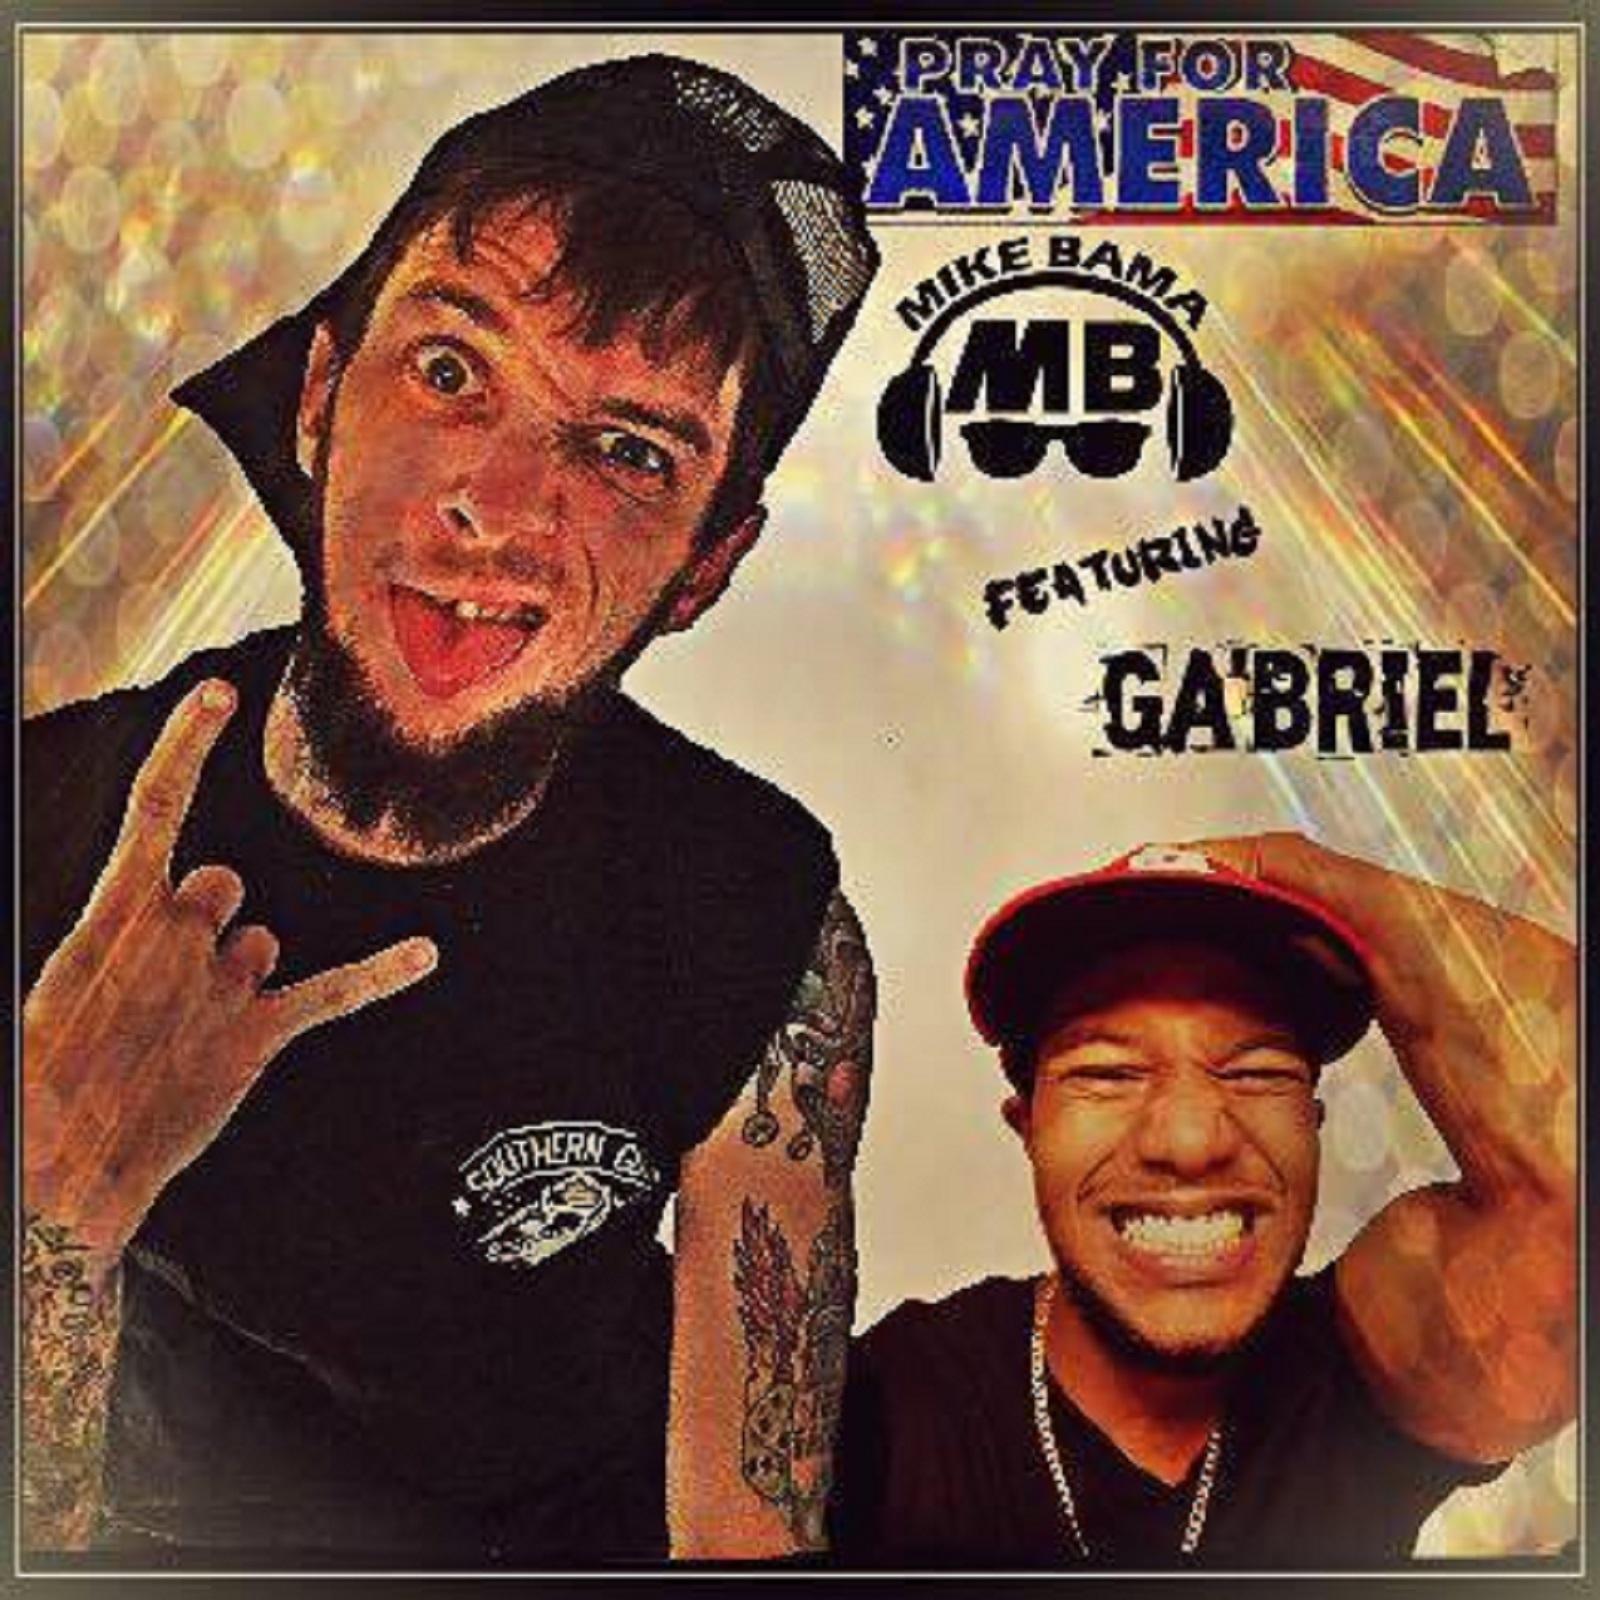 Pray for America (feat. Ga'briel) - Single